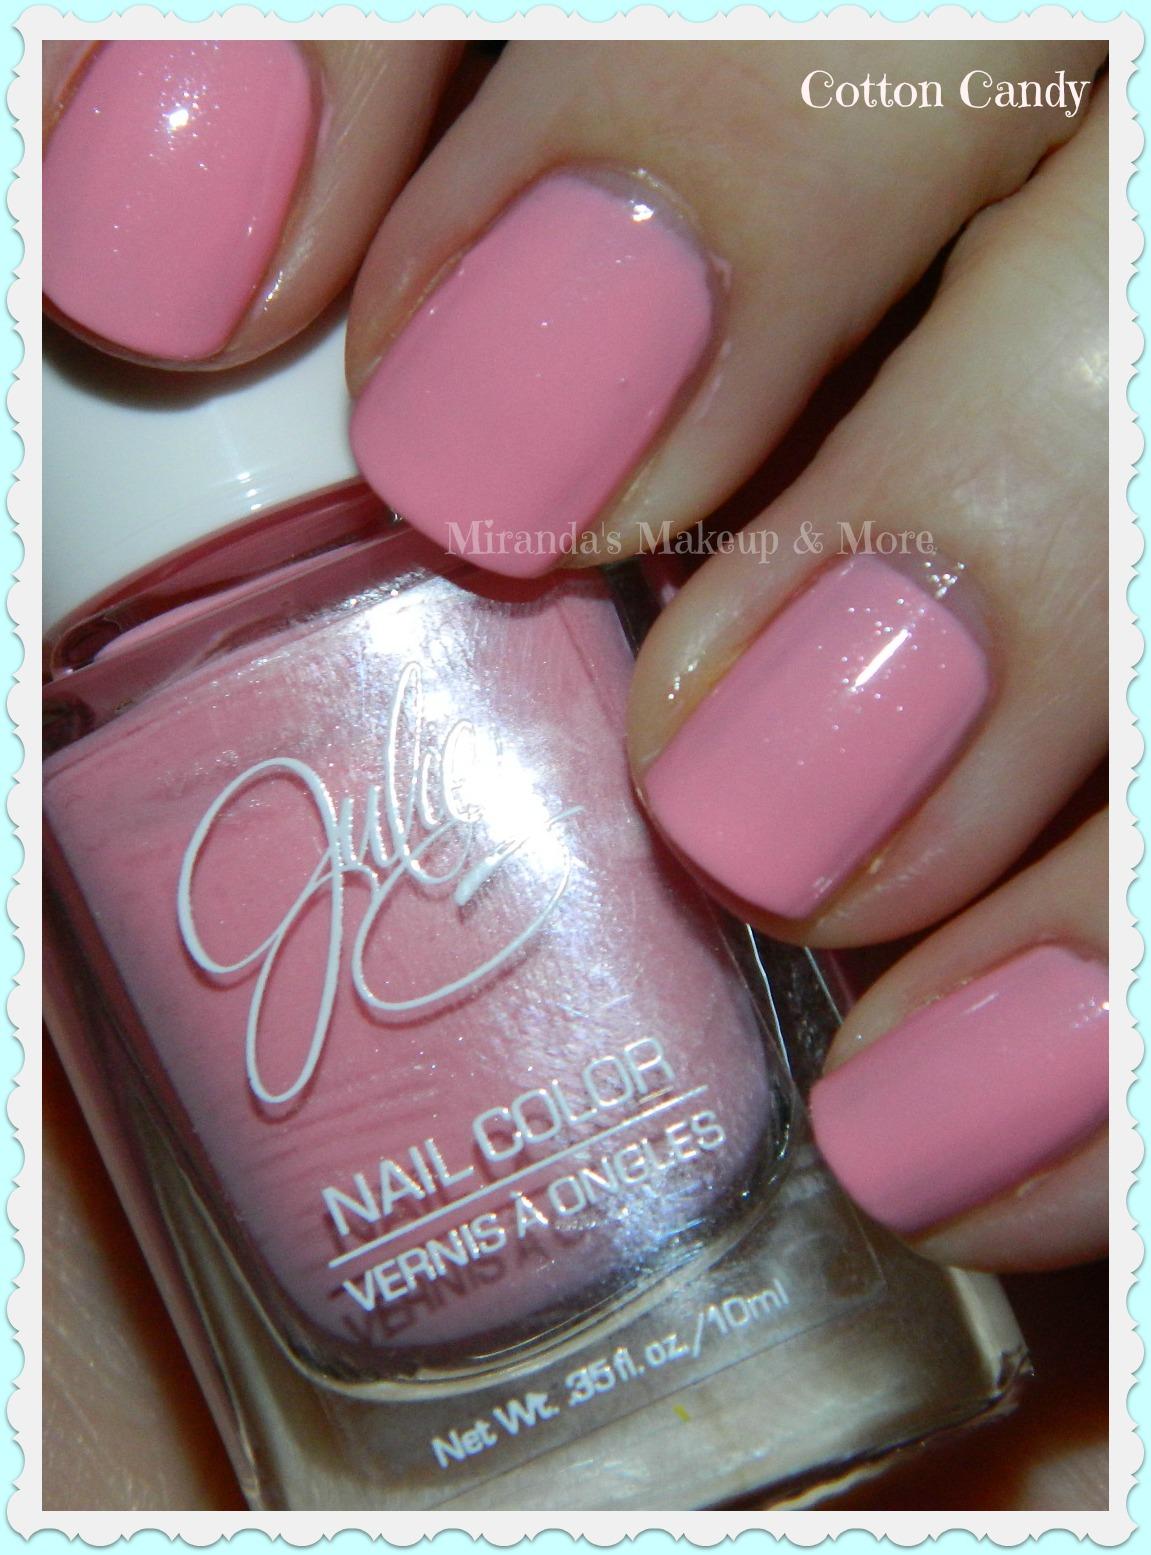 Mirandas Makeup: Julie G Nail polish: Cotton Candy